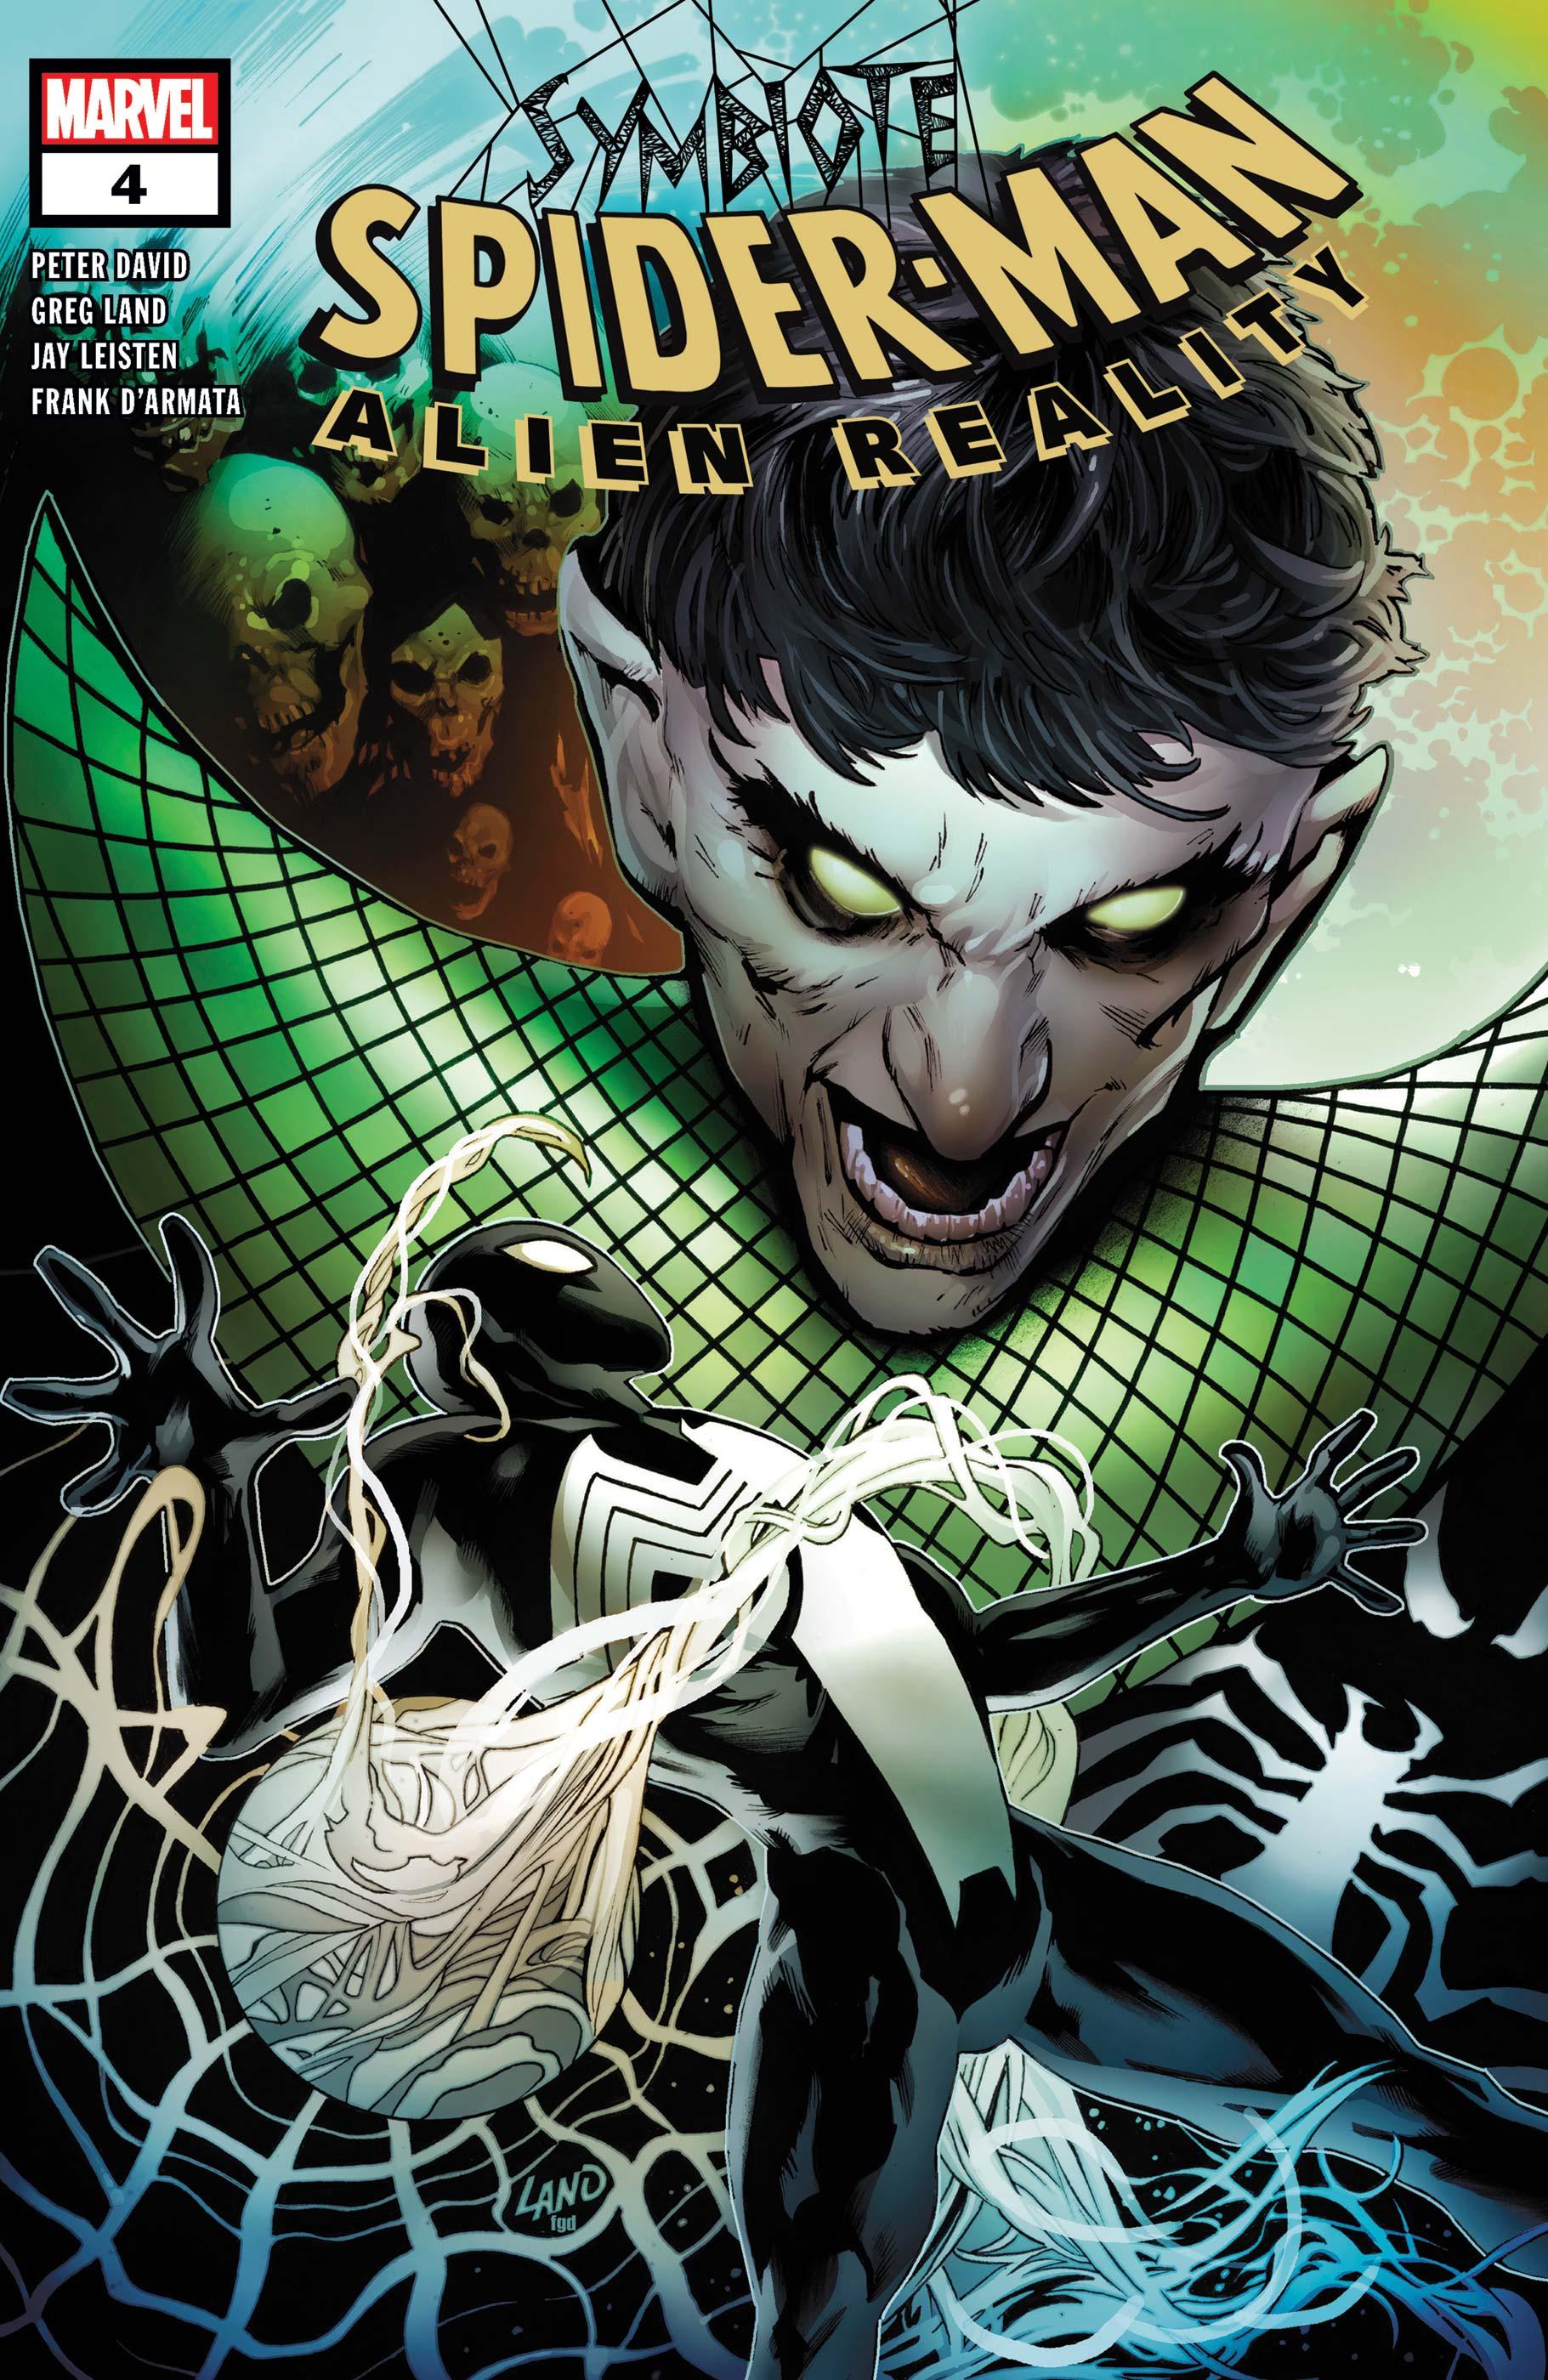 Symbiote Spider-Man: Alien Reality (2019) #4